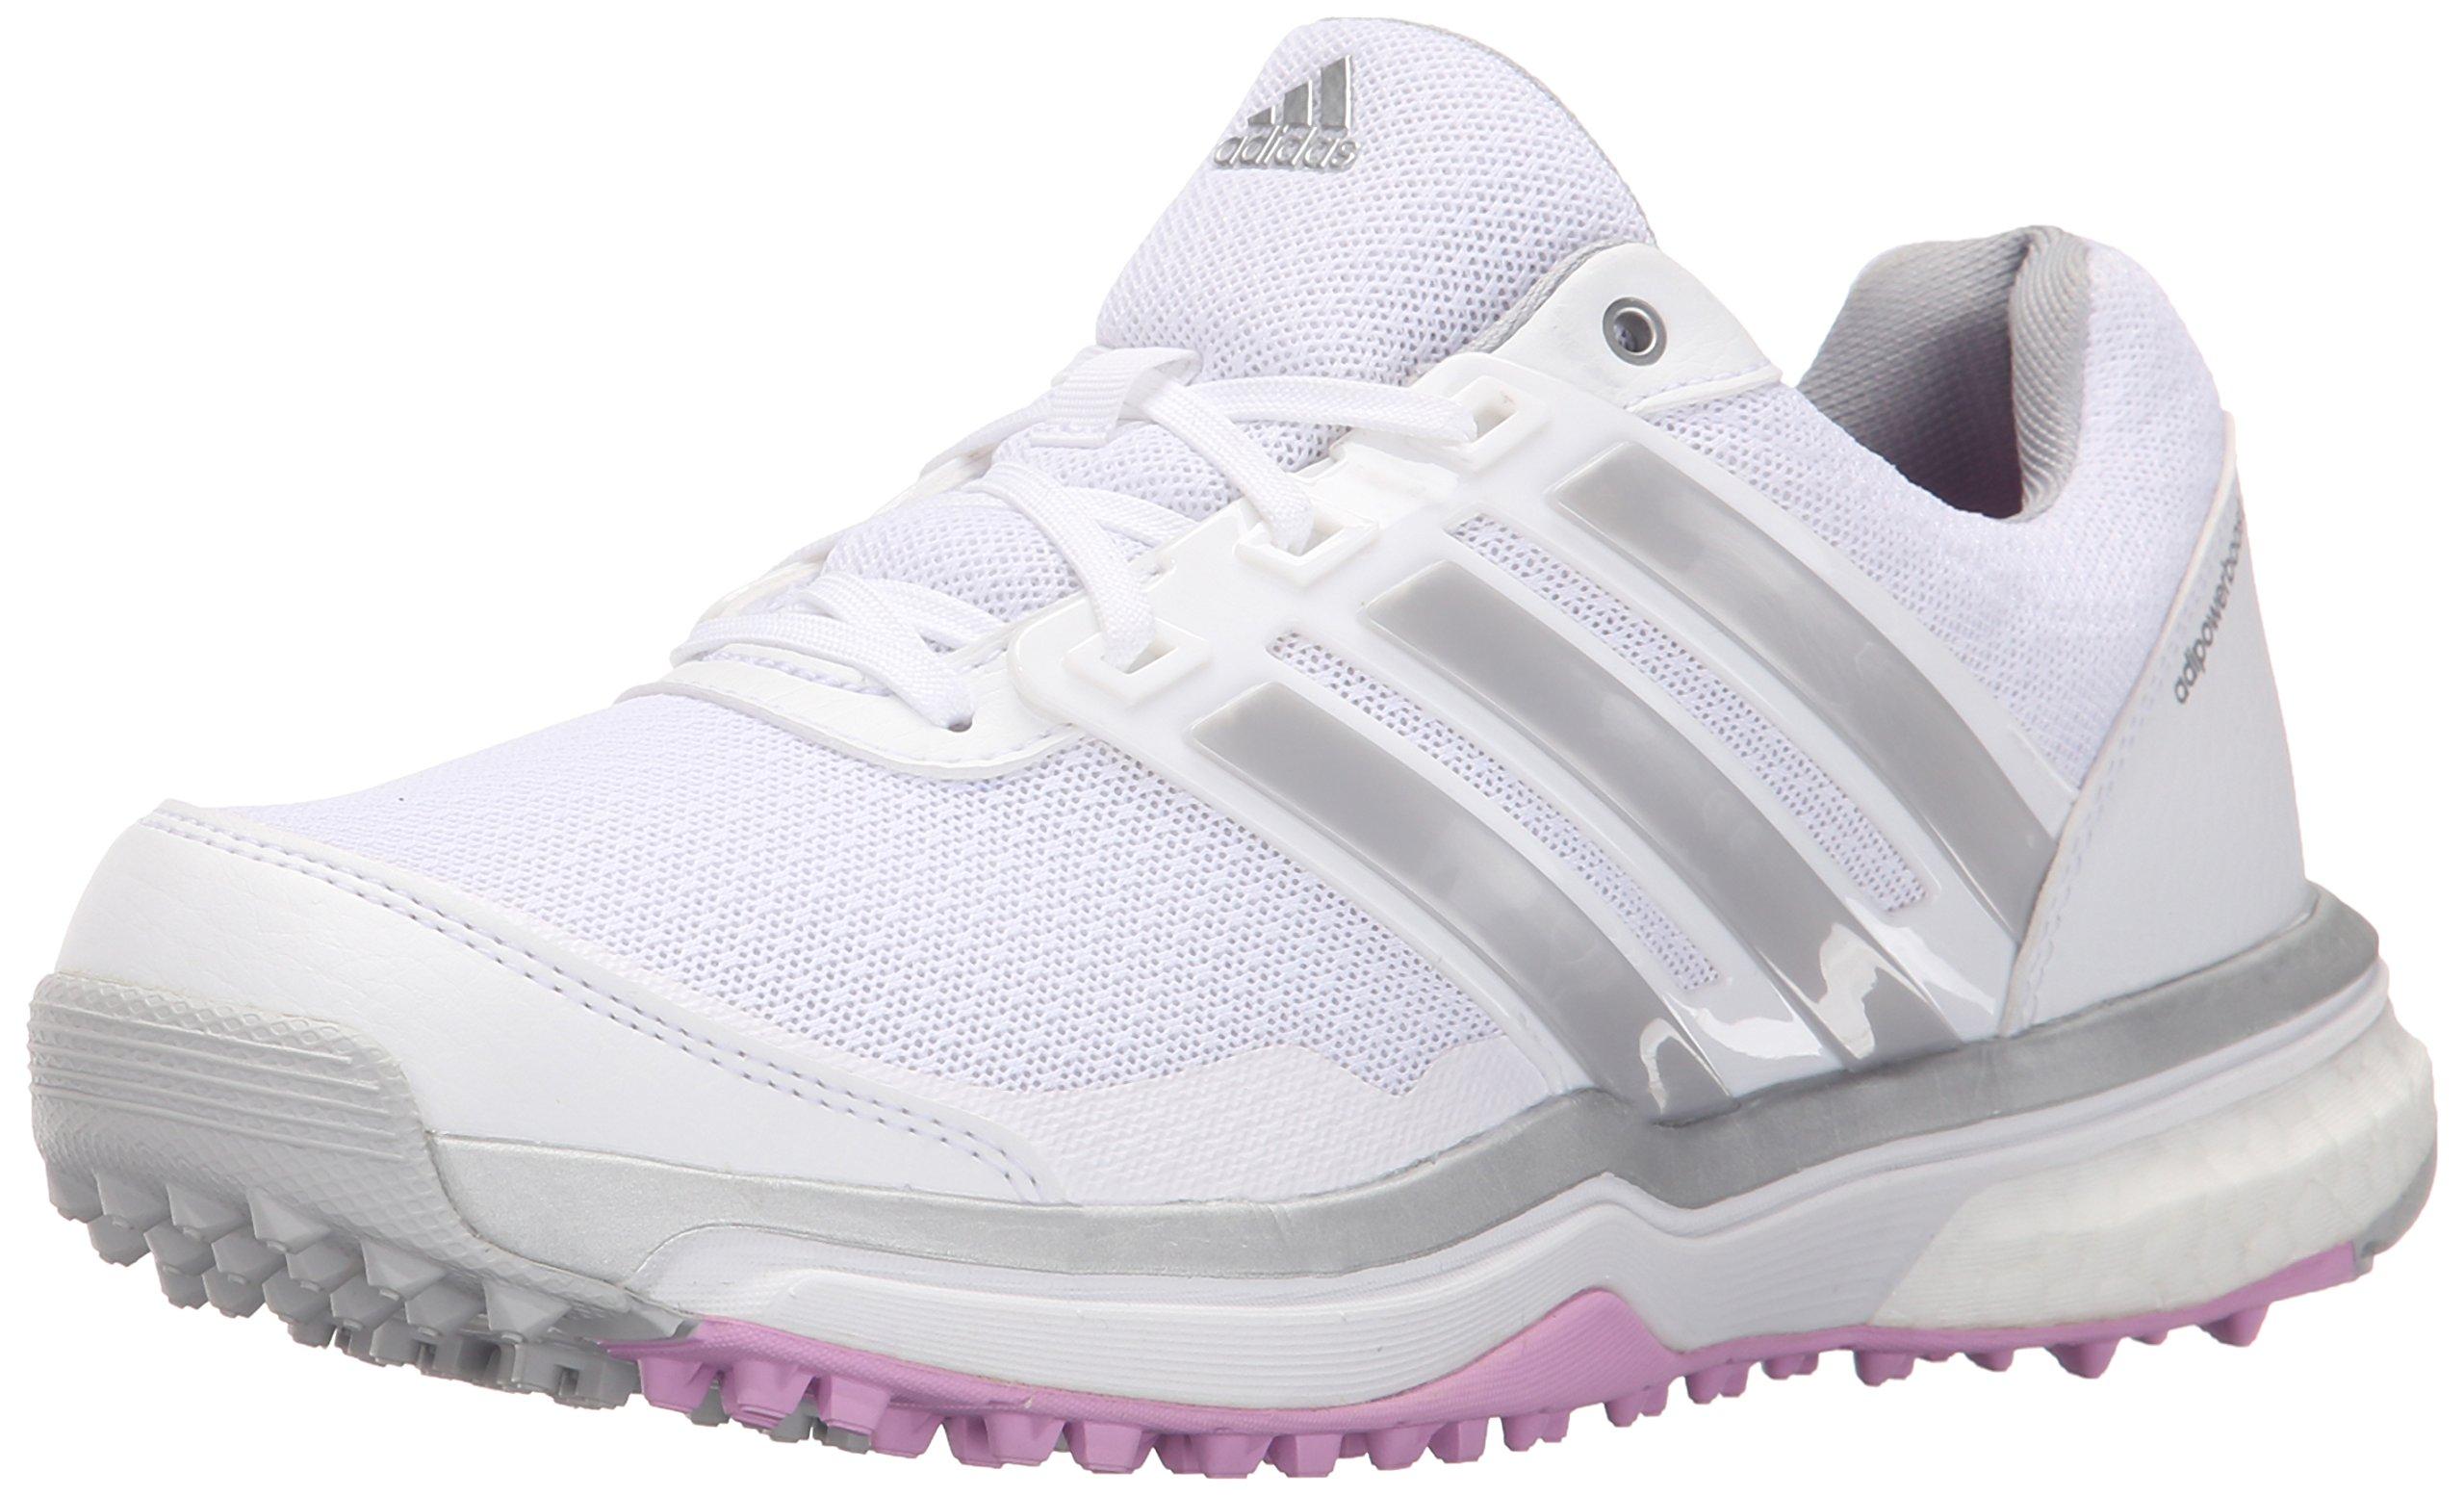 adidas Women's W Adipower S Boost II Spikeless Golf Shoe